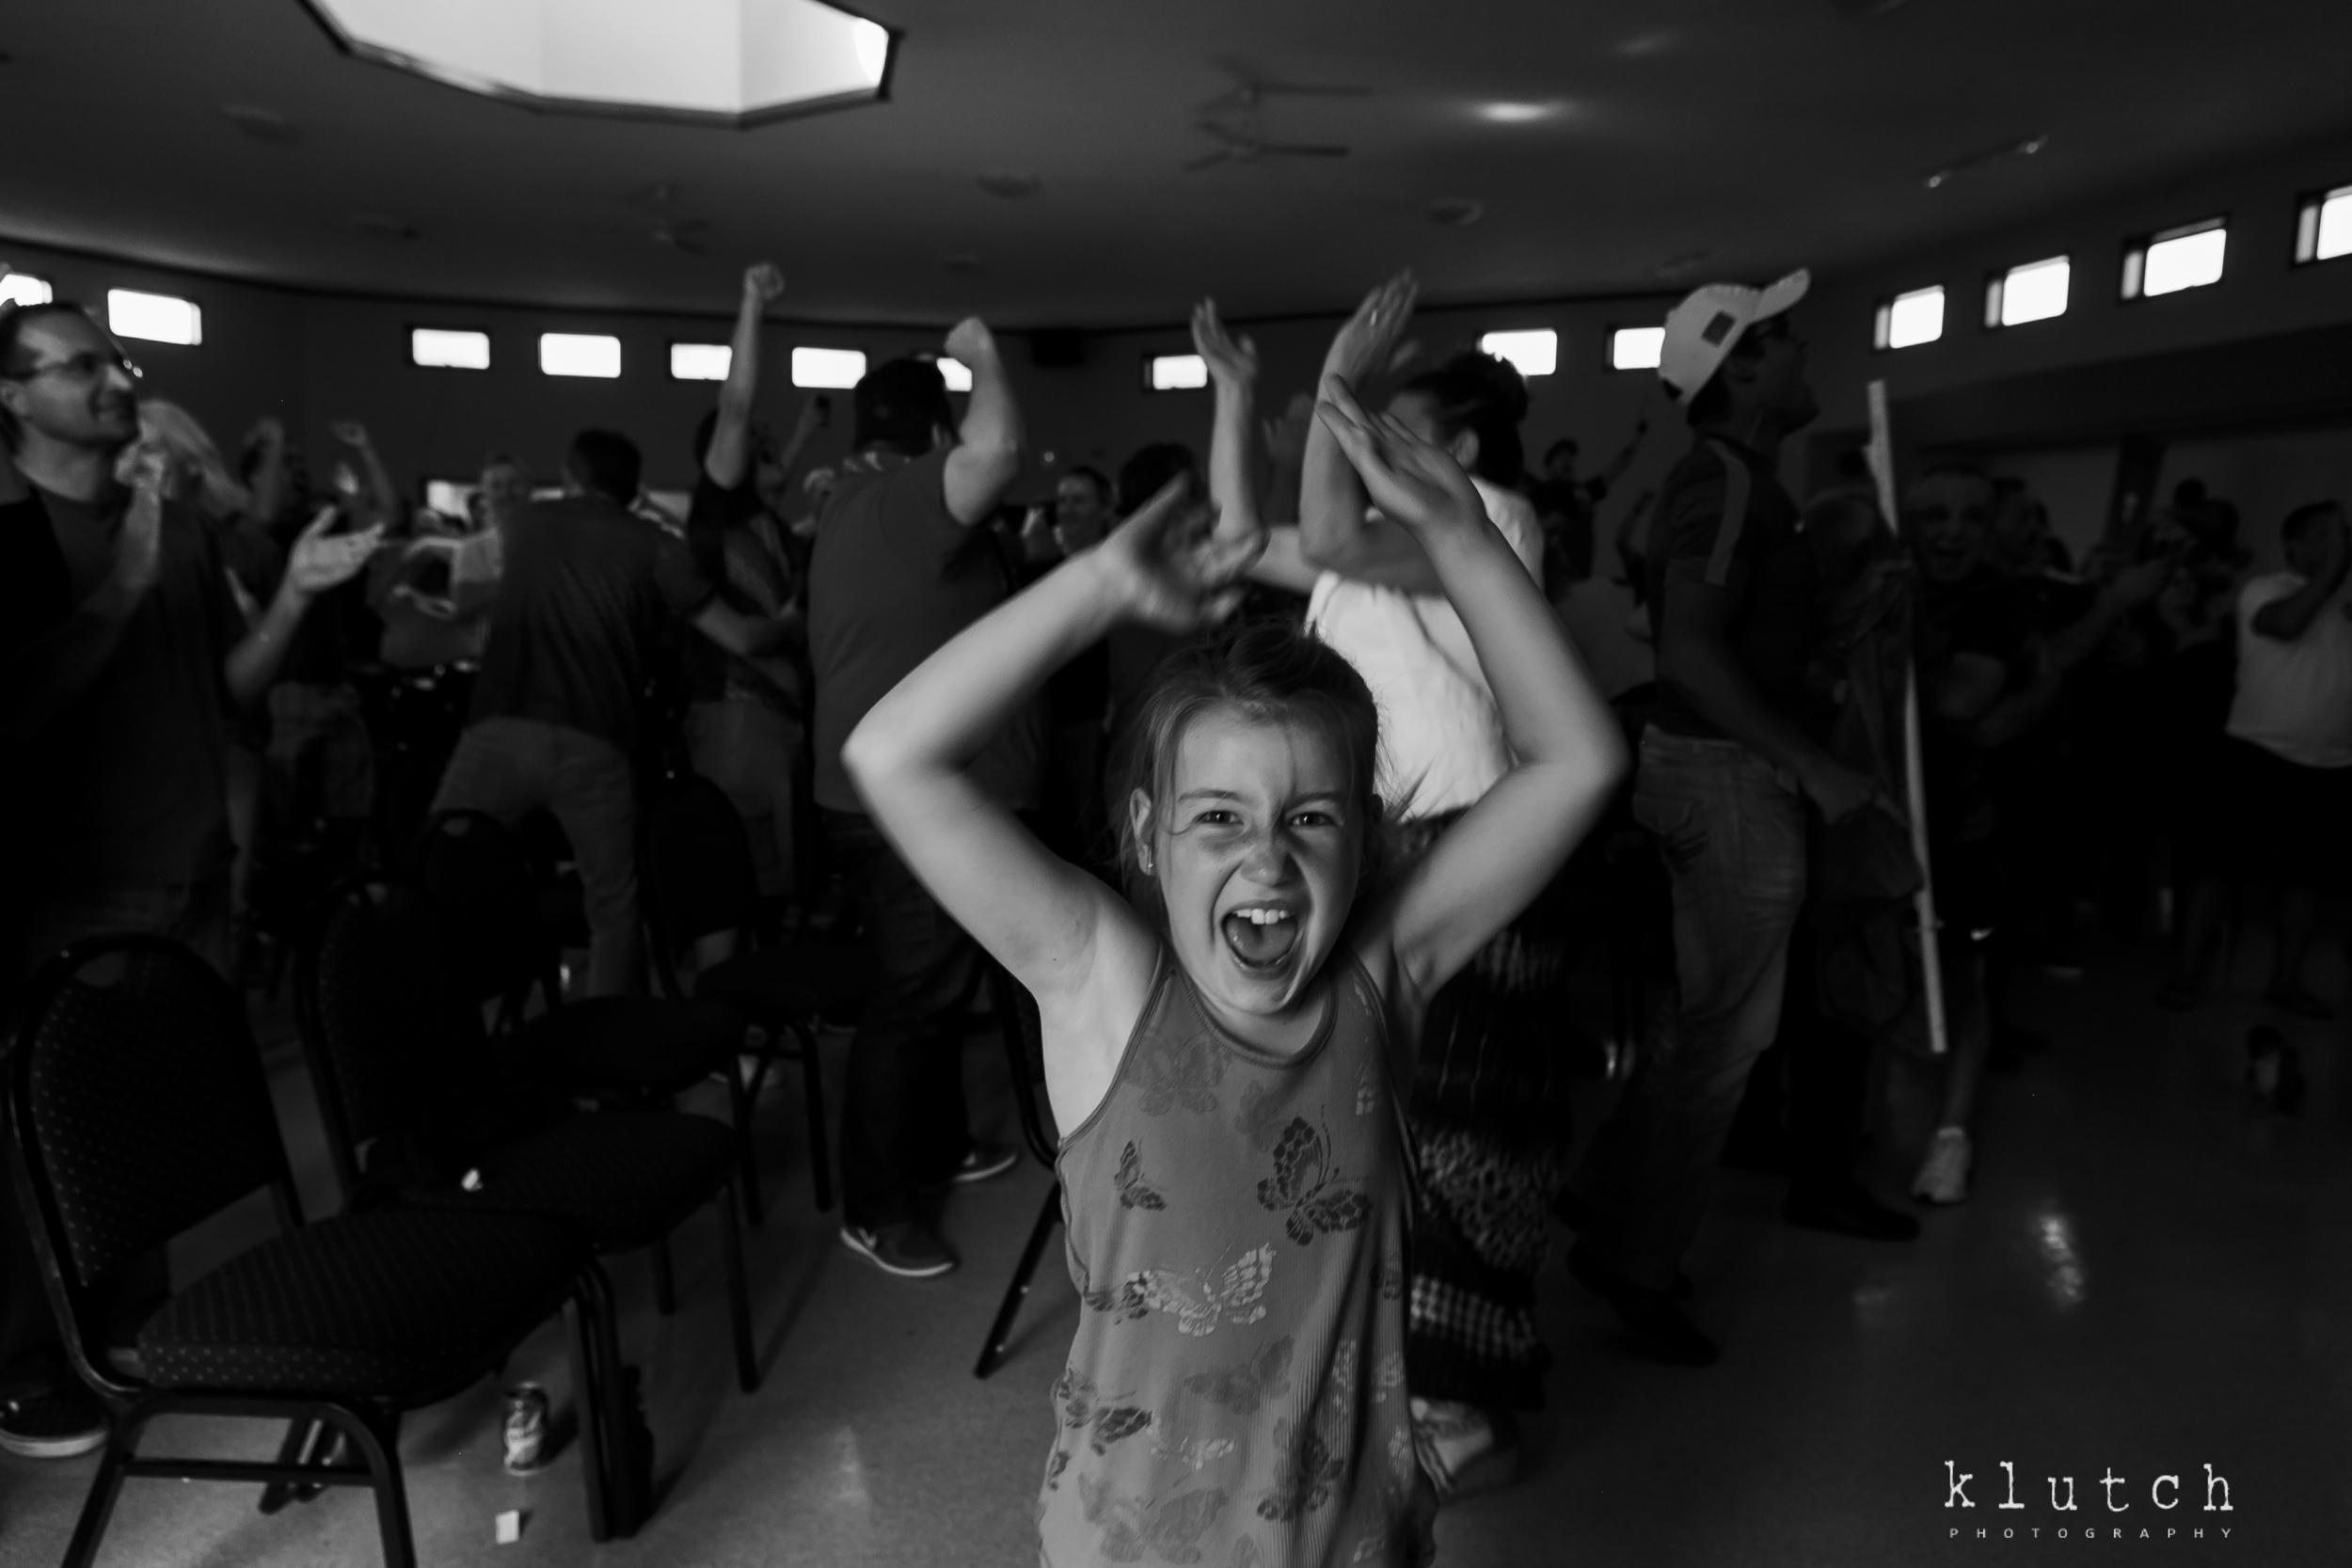 Klutch Photography, vancouver family photographer, surrey family photographer, vancouver newnorn photographer, surrey newborn photographer, candid photography, lifestlye photography, lifeunscripted photographer, -2-33.jpg